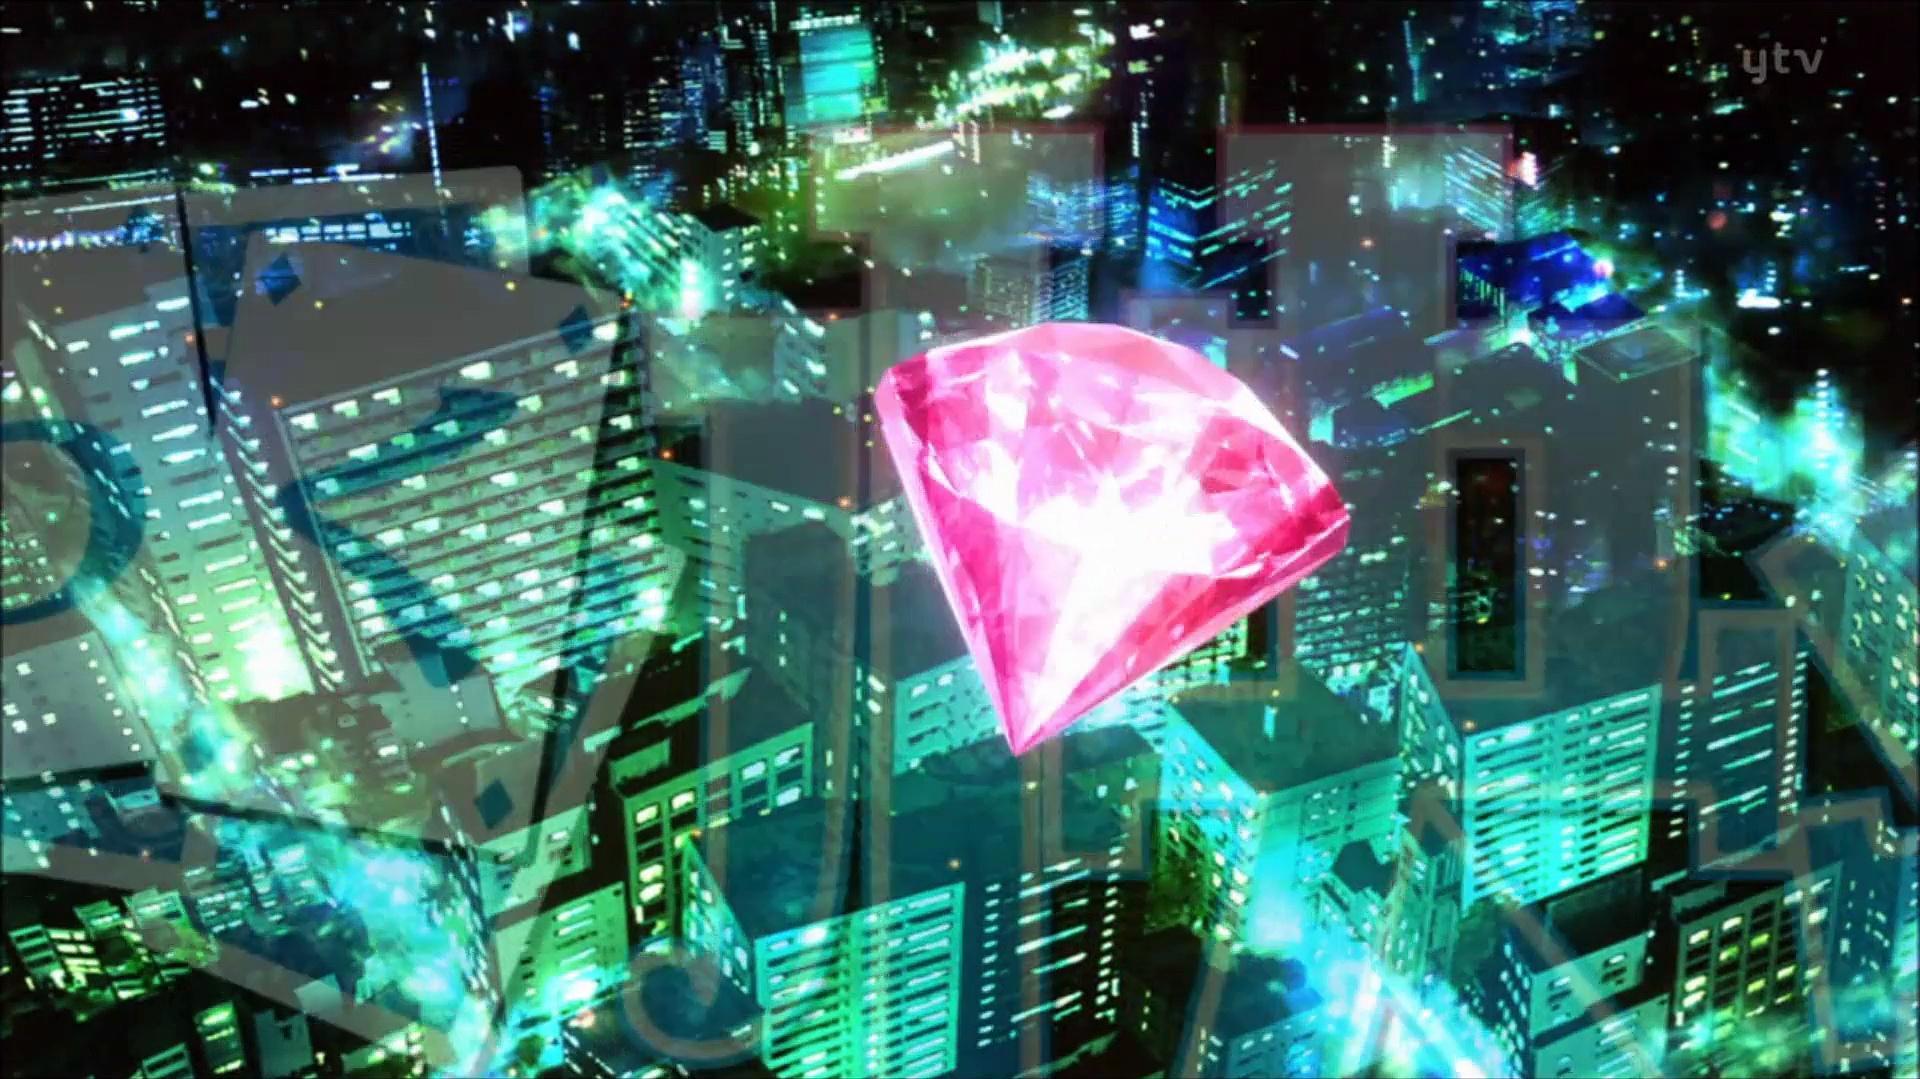 Magic Kaito 1412 - Opening 2 - Ai no Scenario